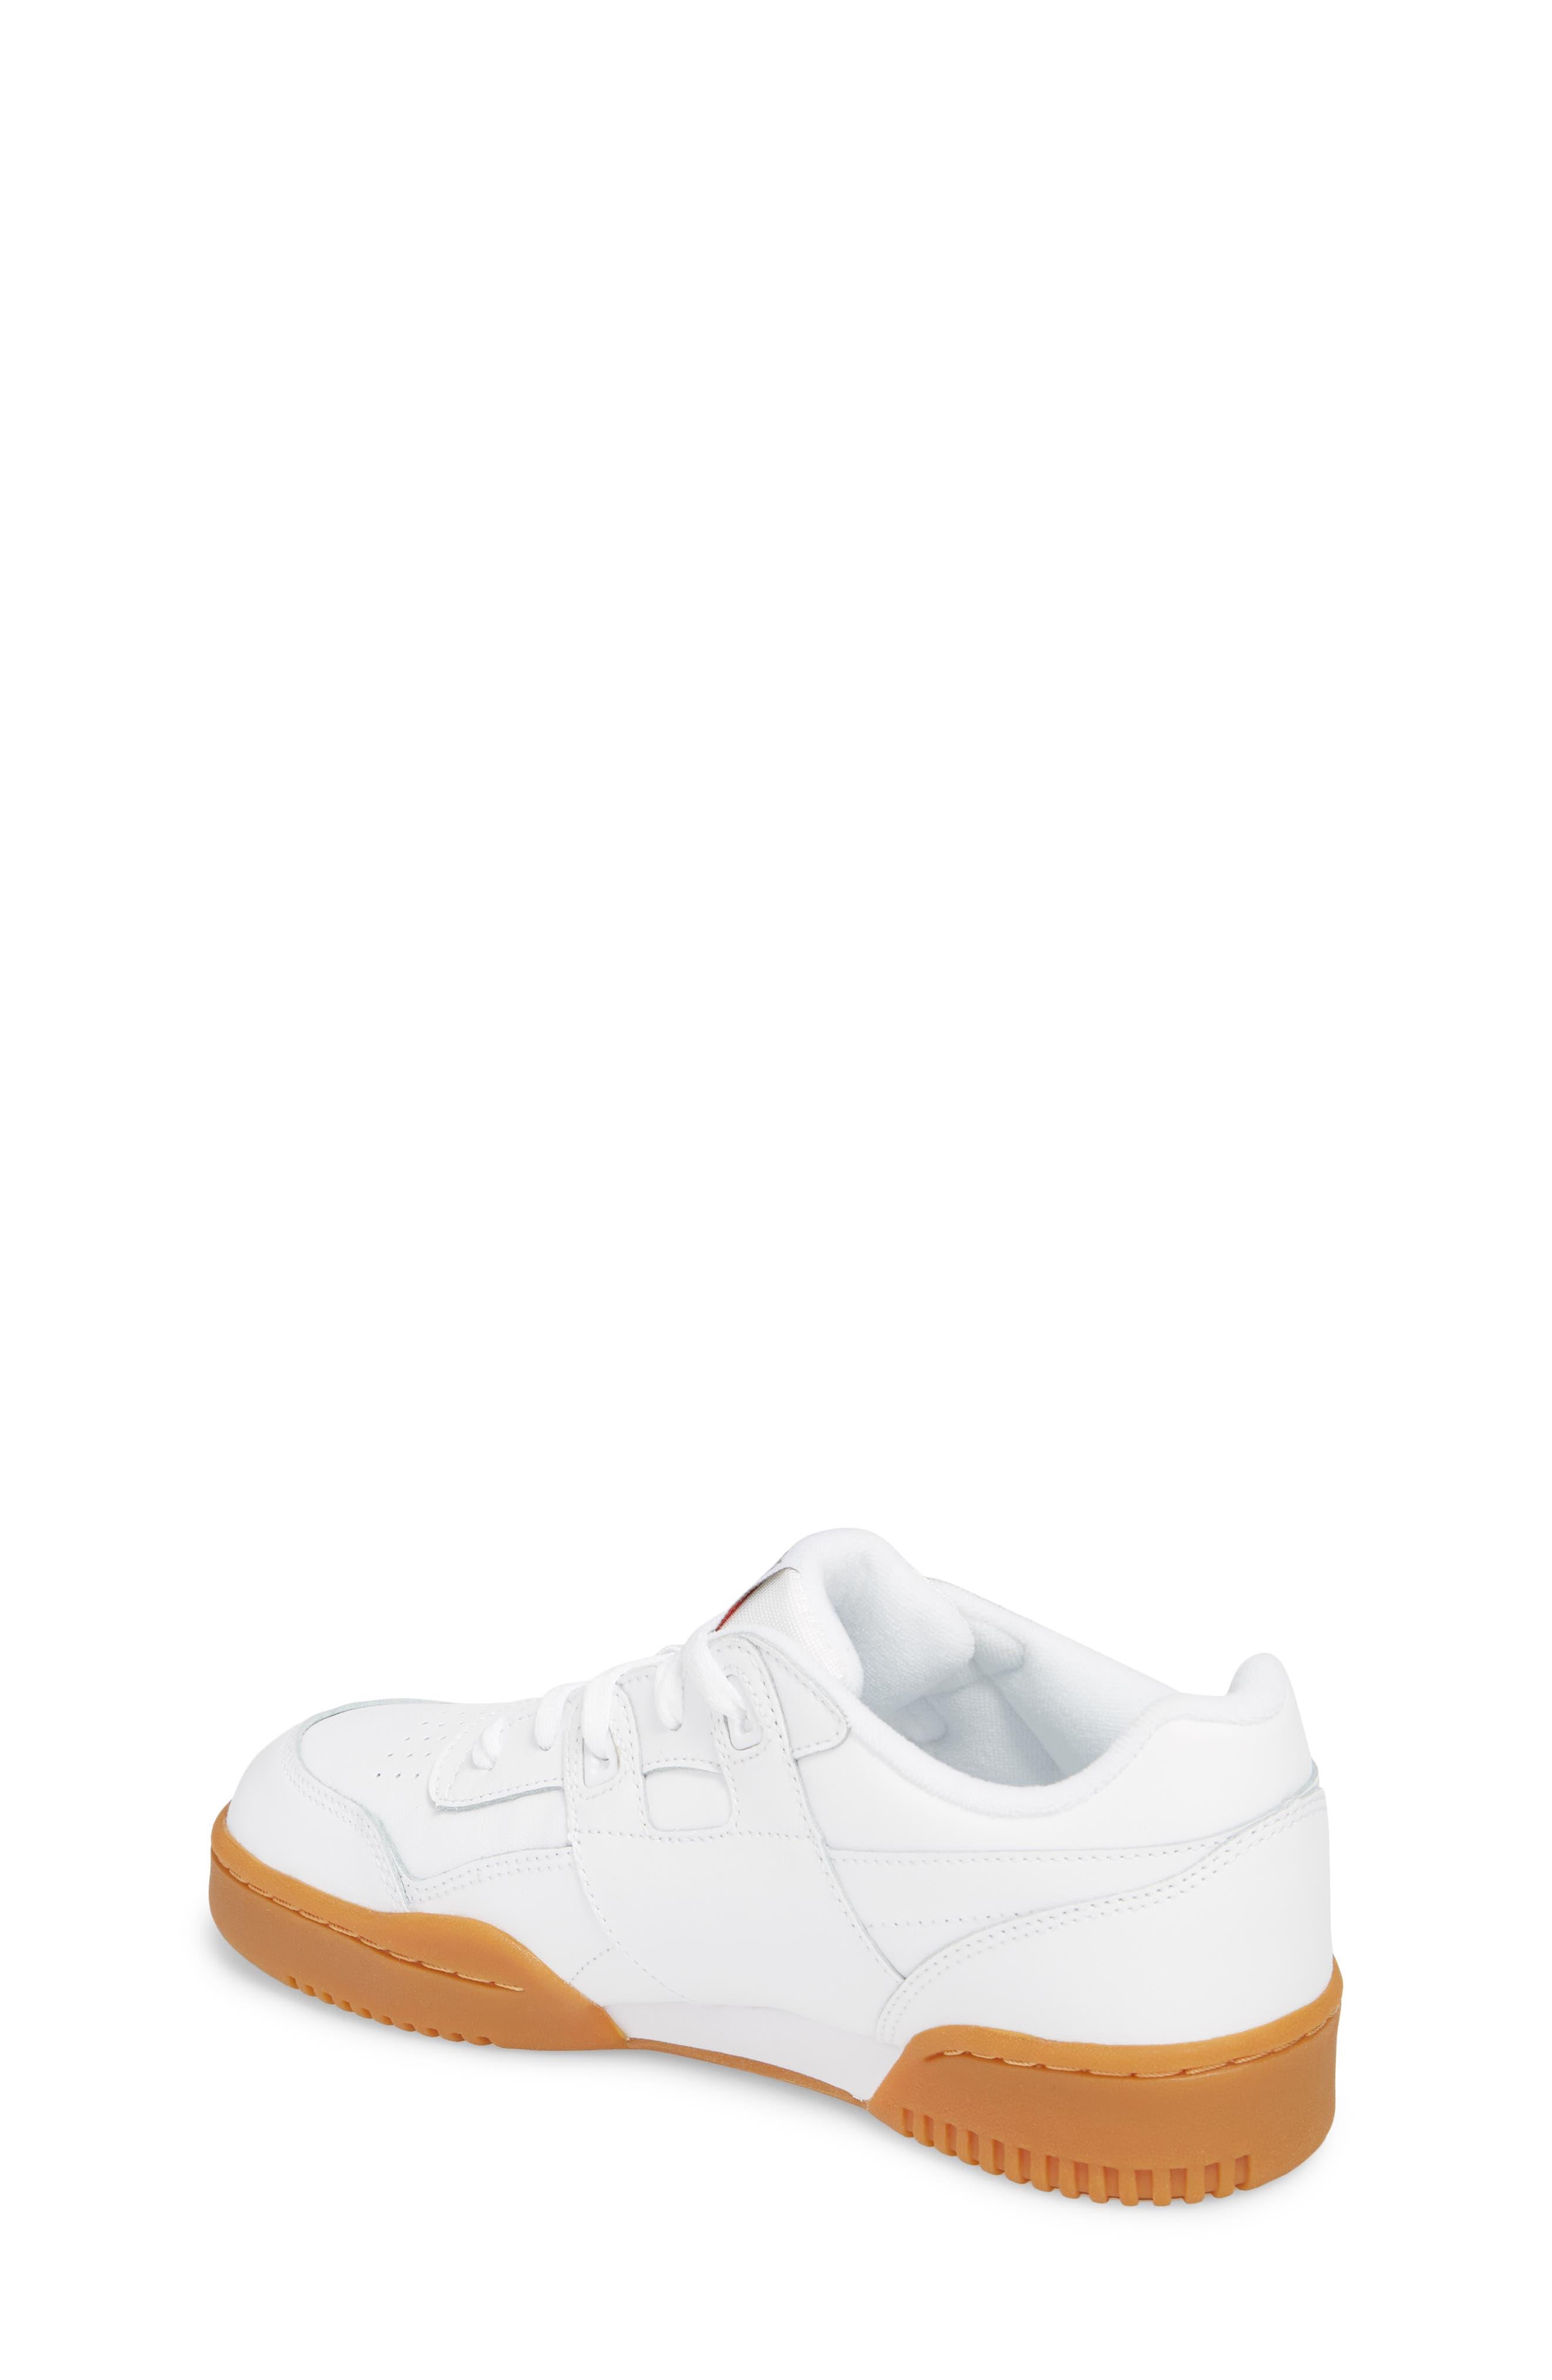 Workout Plus Sneaker,                             Alternate thumbnail 2, color,                             WHITE